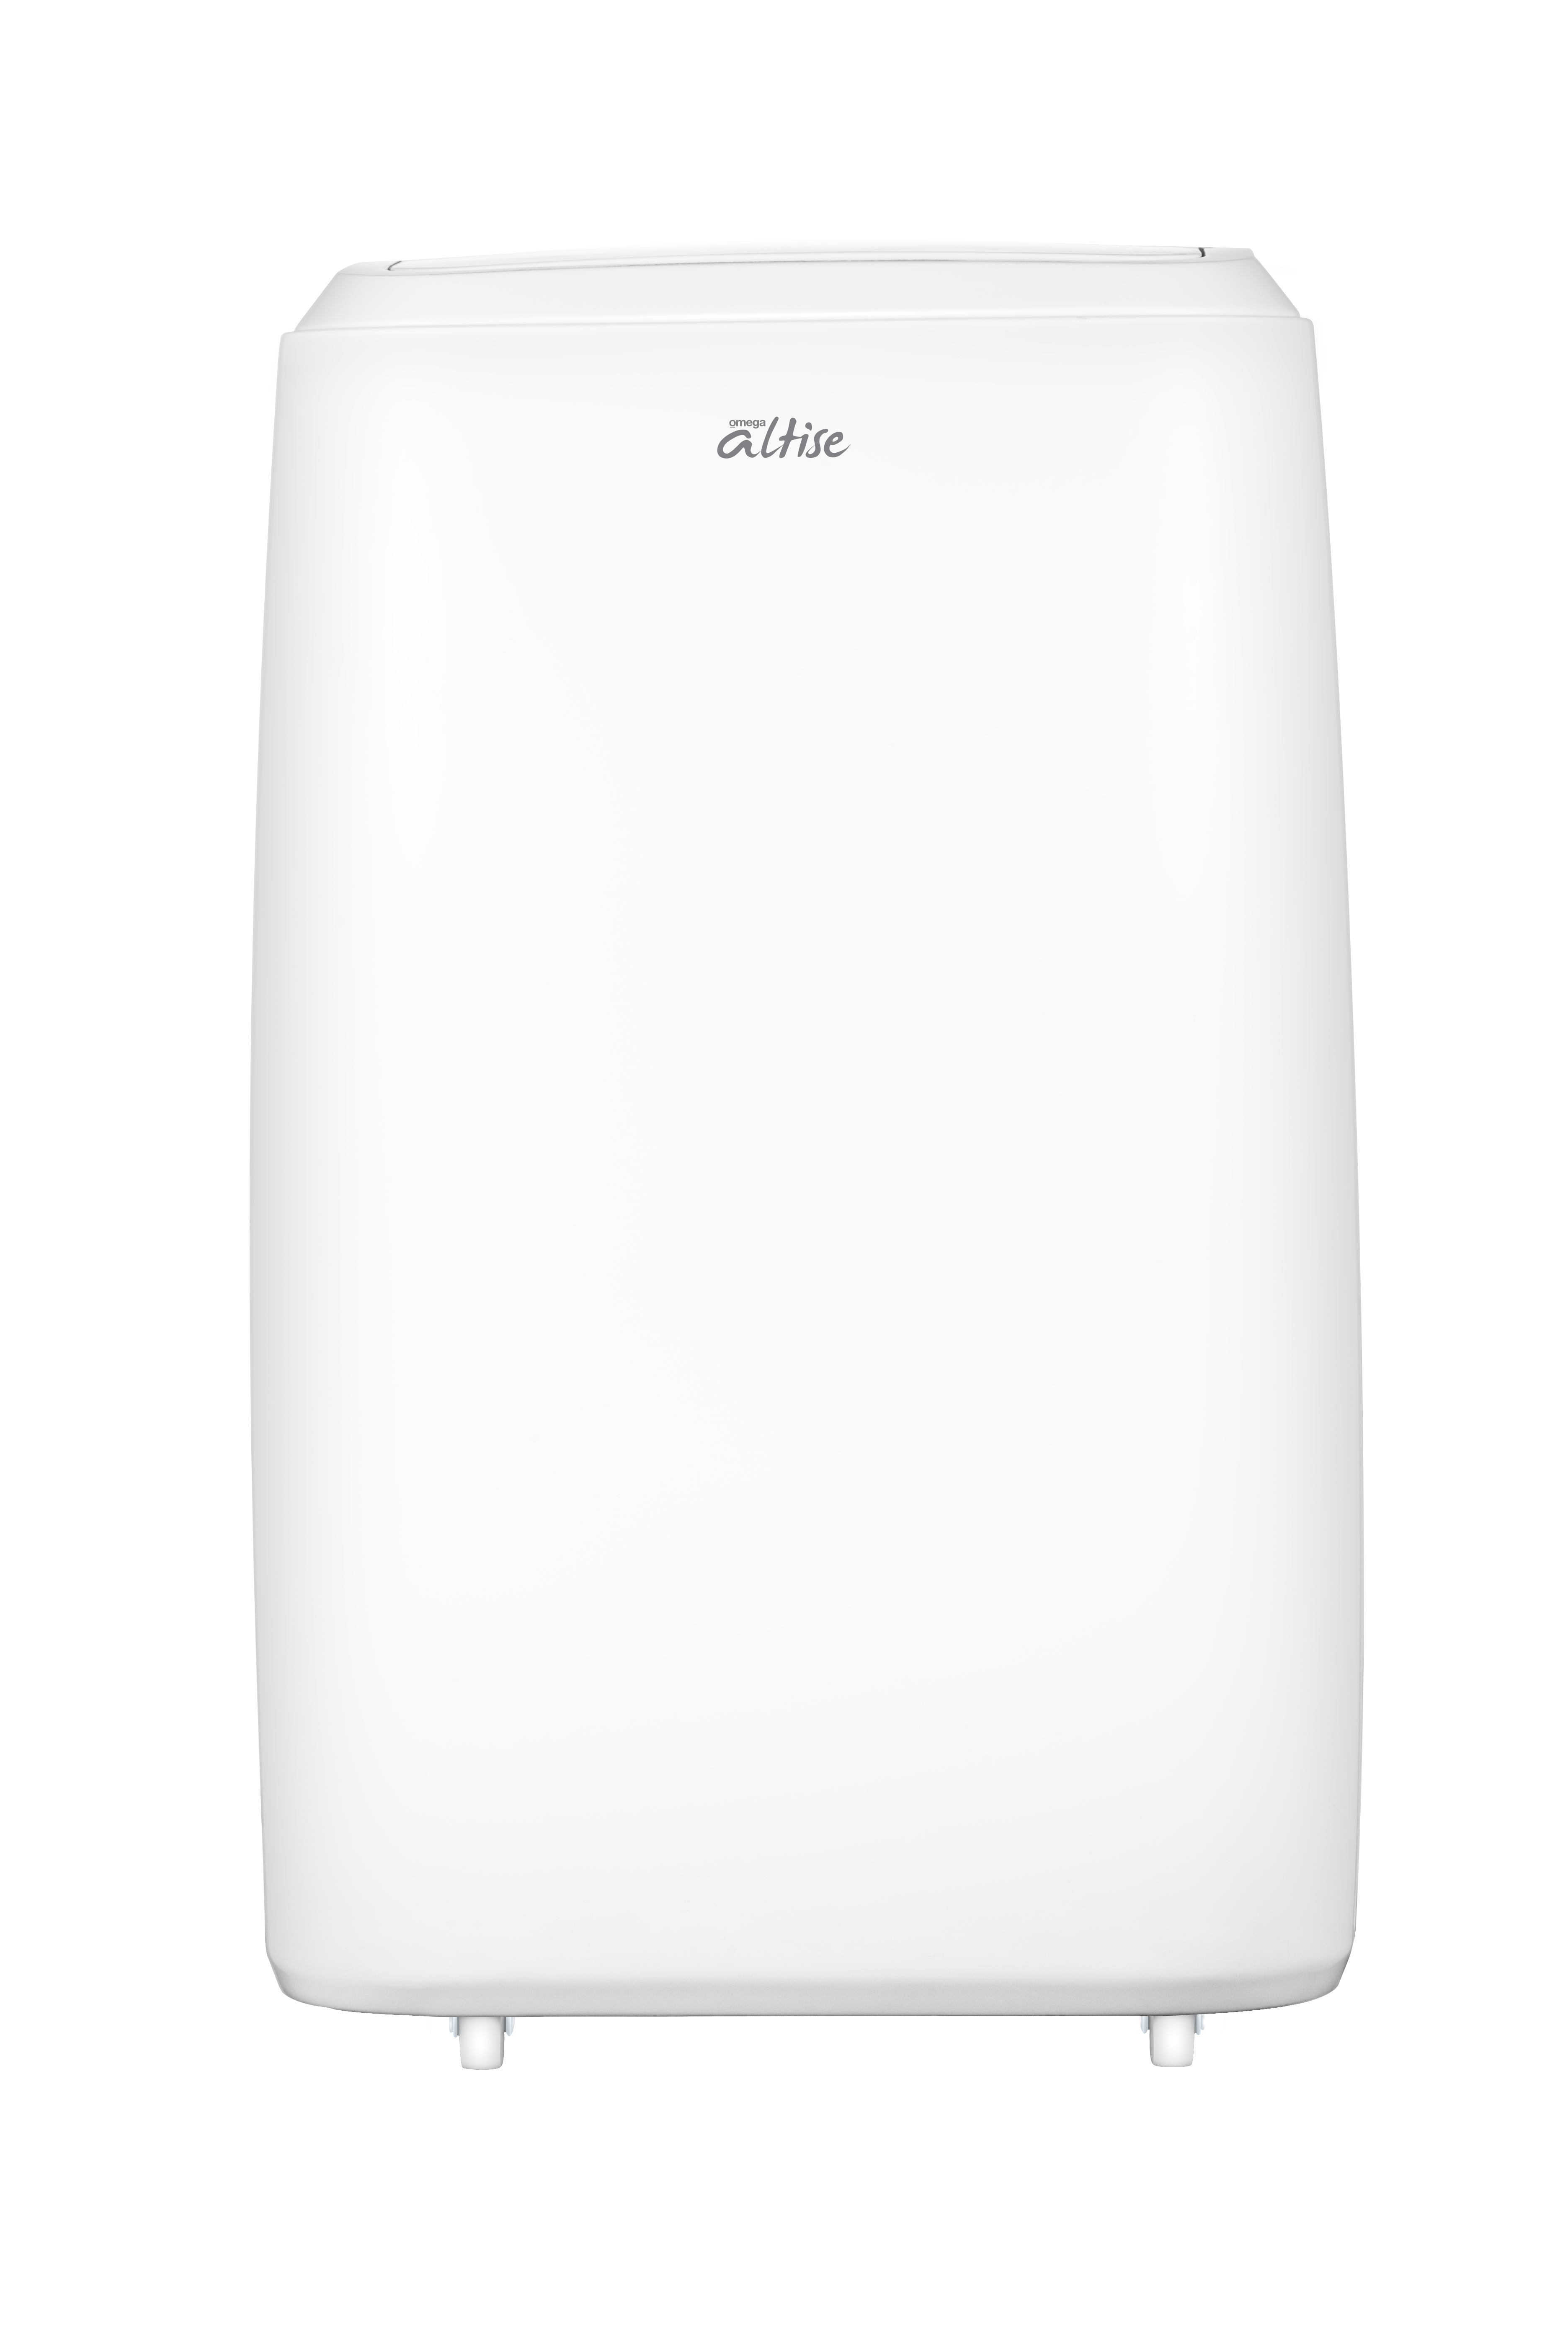 Omega Altise product 5.2kW Slimline Portable Air-ConditionerOAPC187